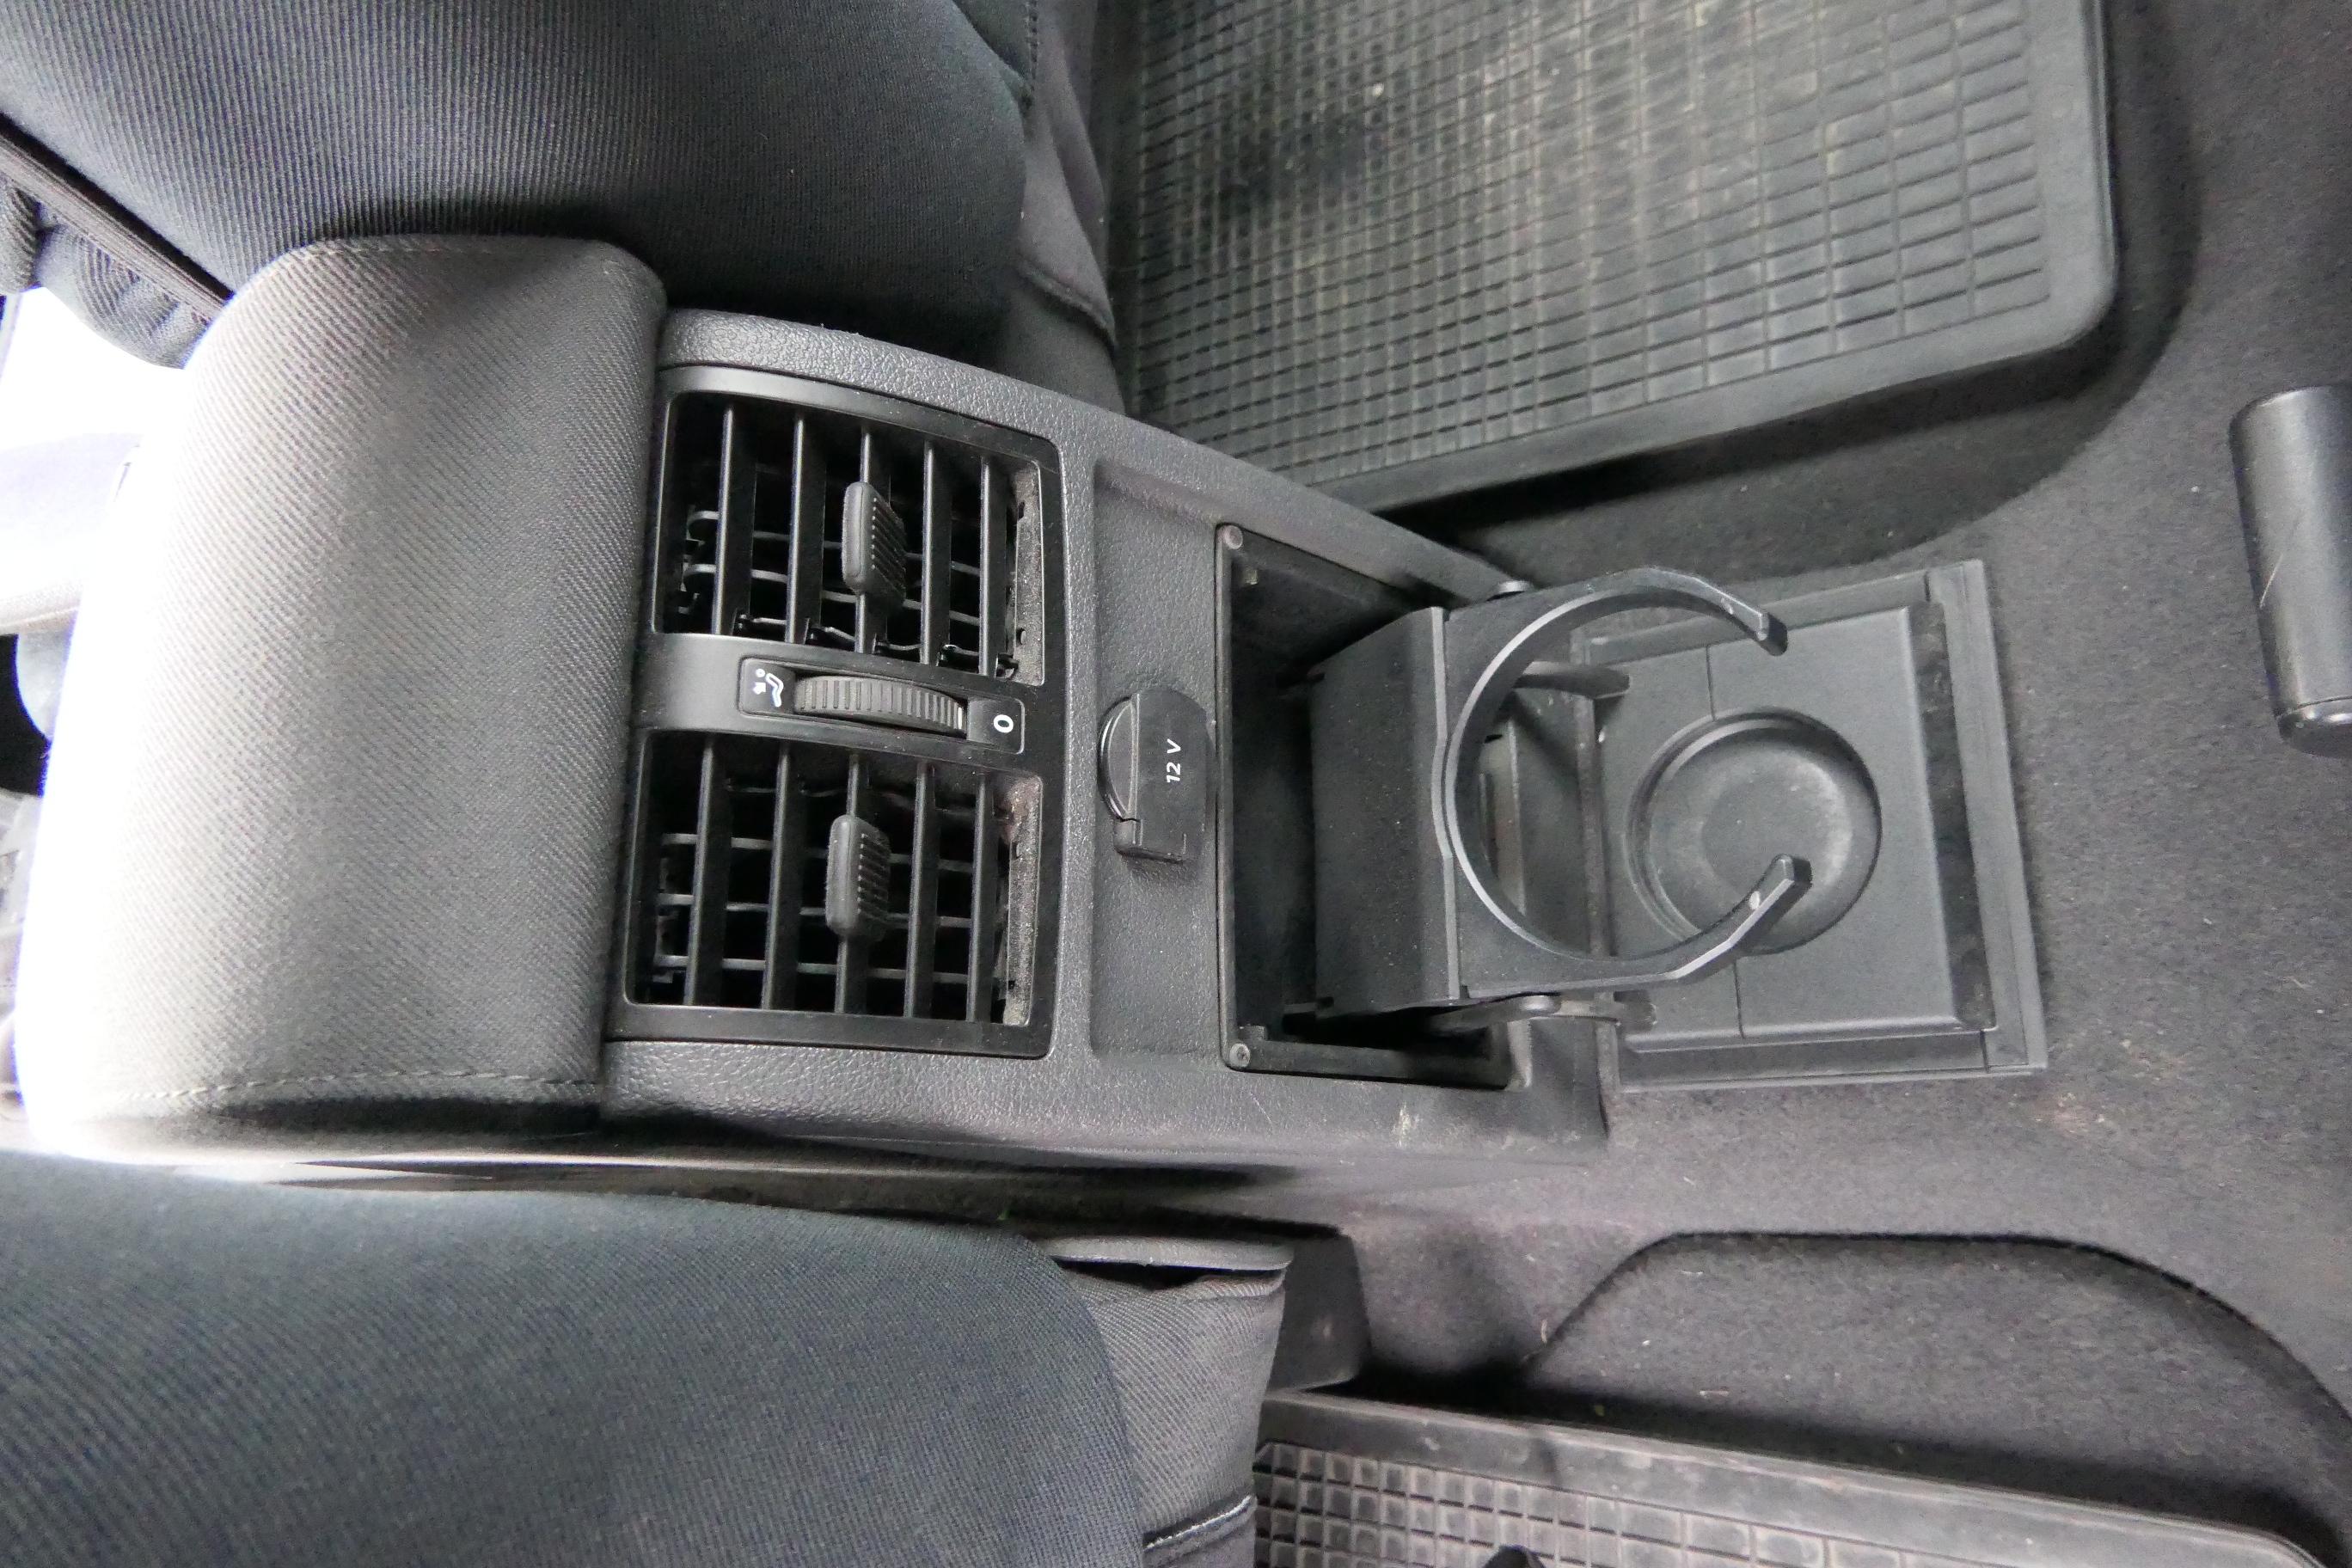 vw caddy 3 2k mittelarmlehne armlehne fach komplett. Black Bedroom Furniture Sets. Home Design Ideas